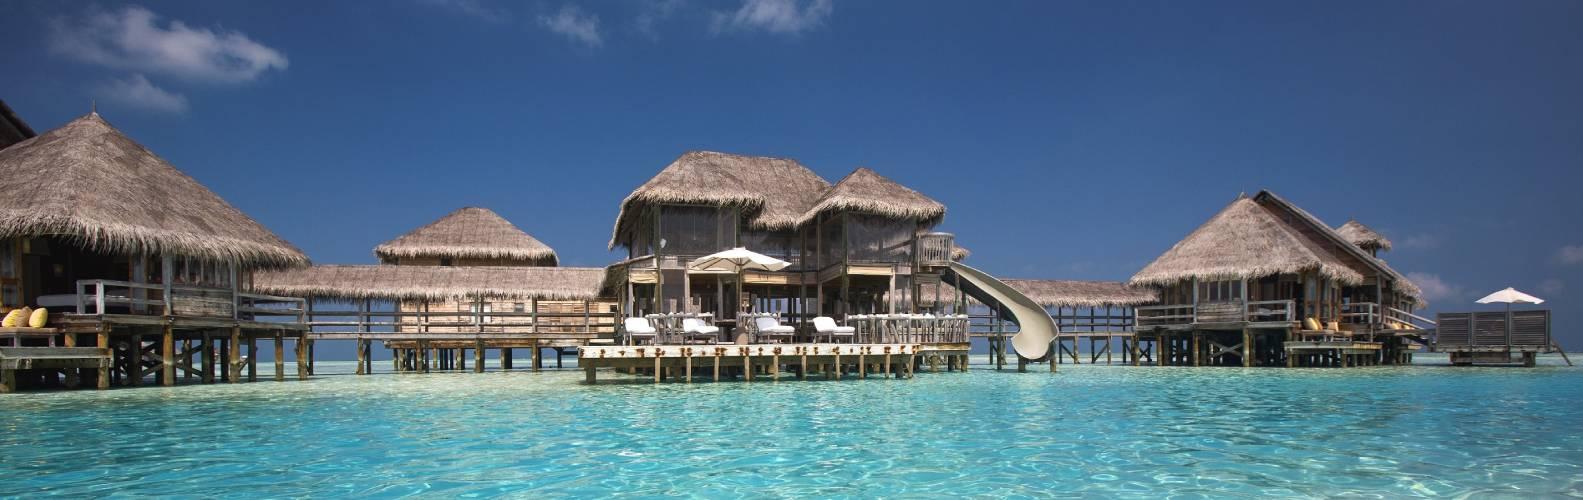 Gili Lankanfushi Maldives - The Private Reserve